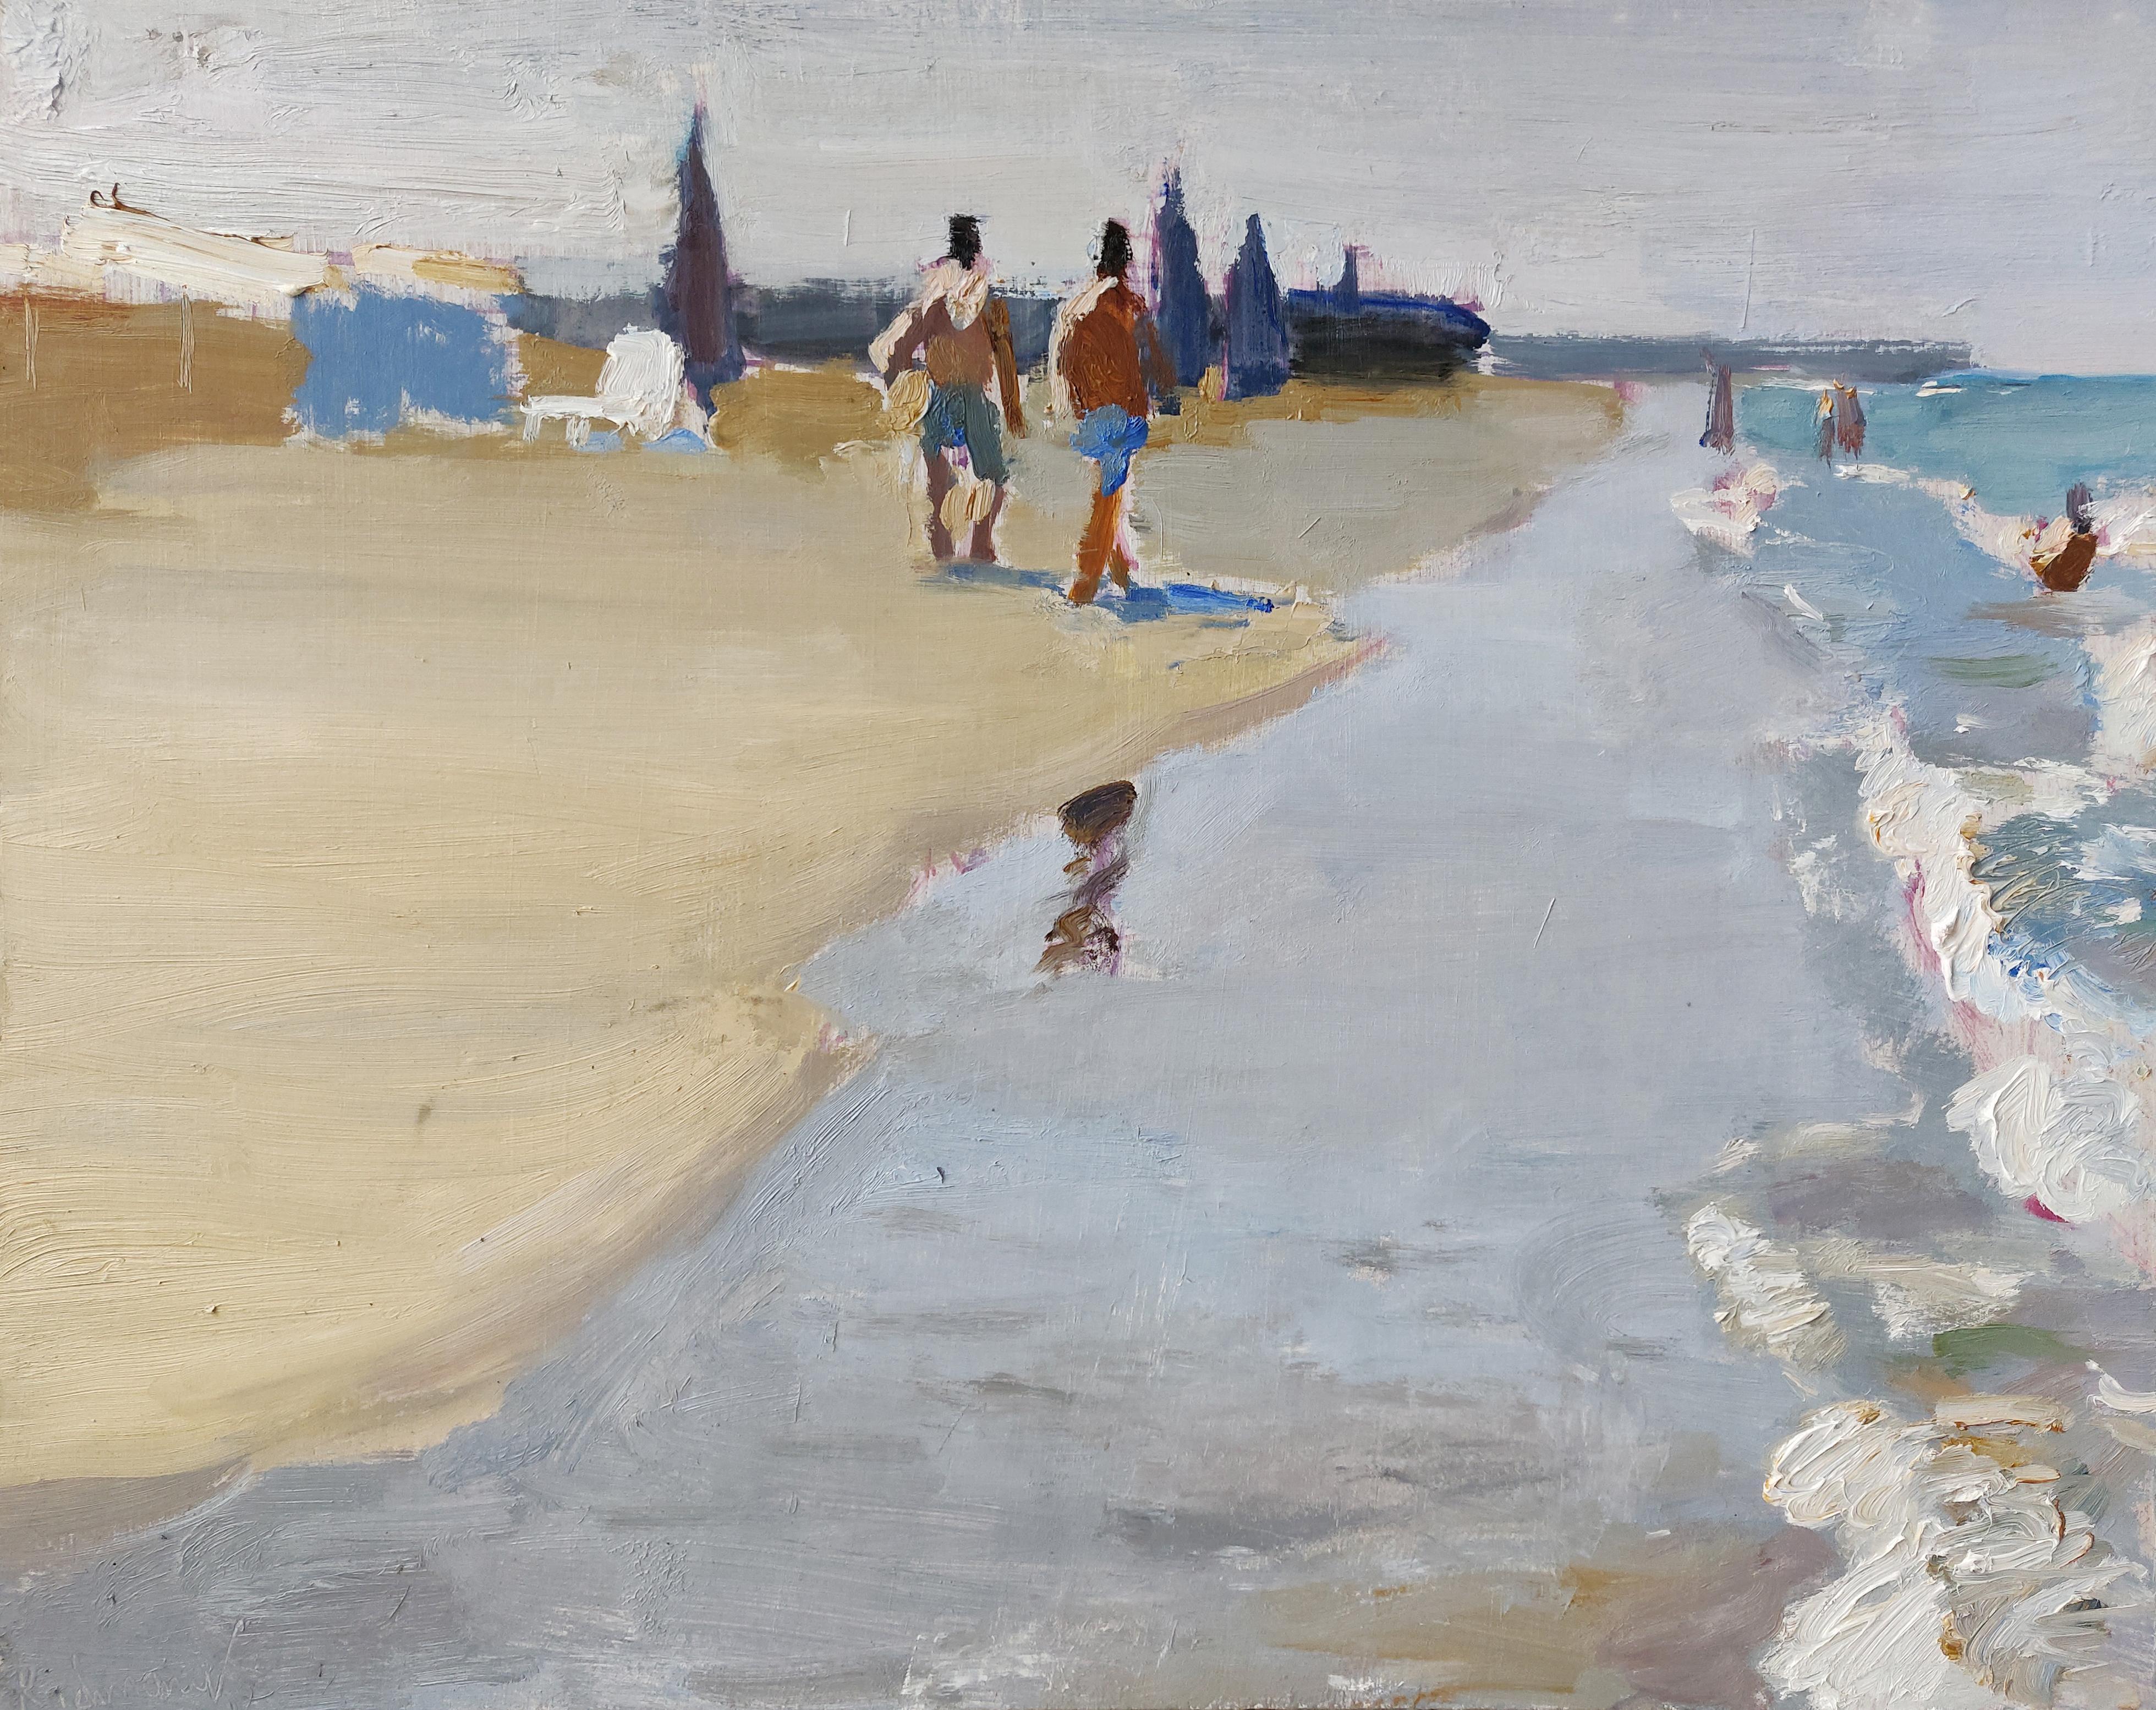 On the Beach - 21st Century Contemporary Summer Scene OIl Painting